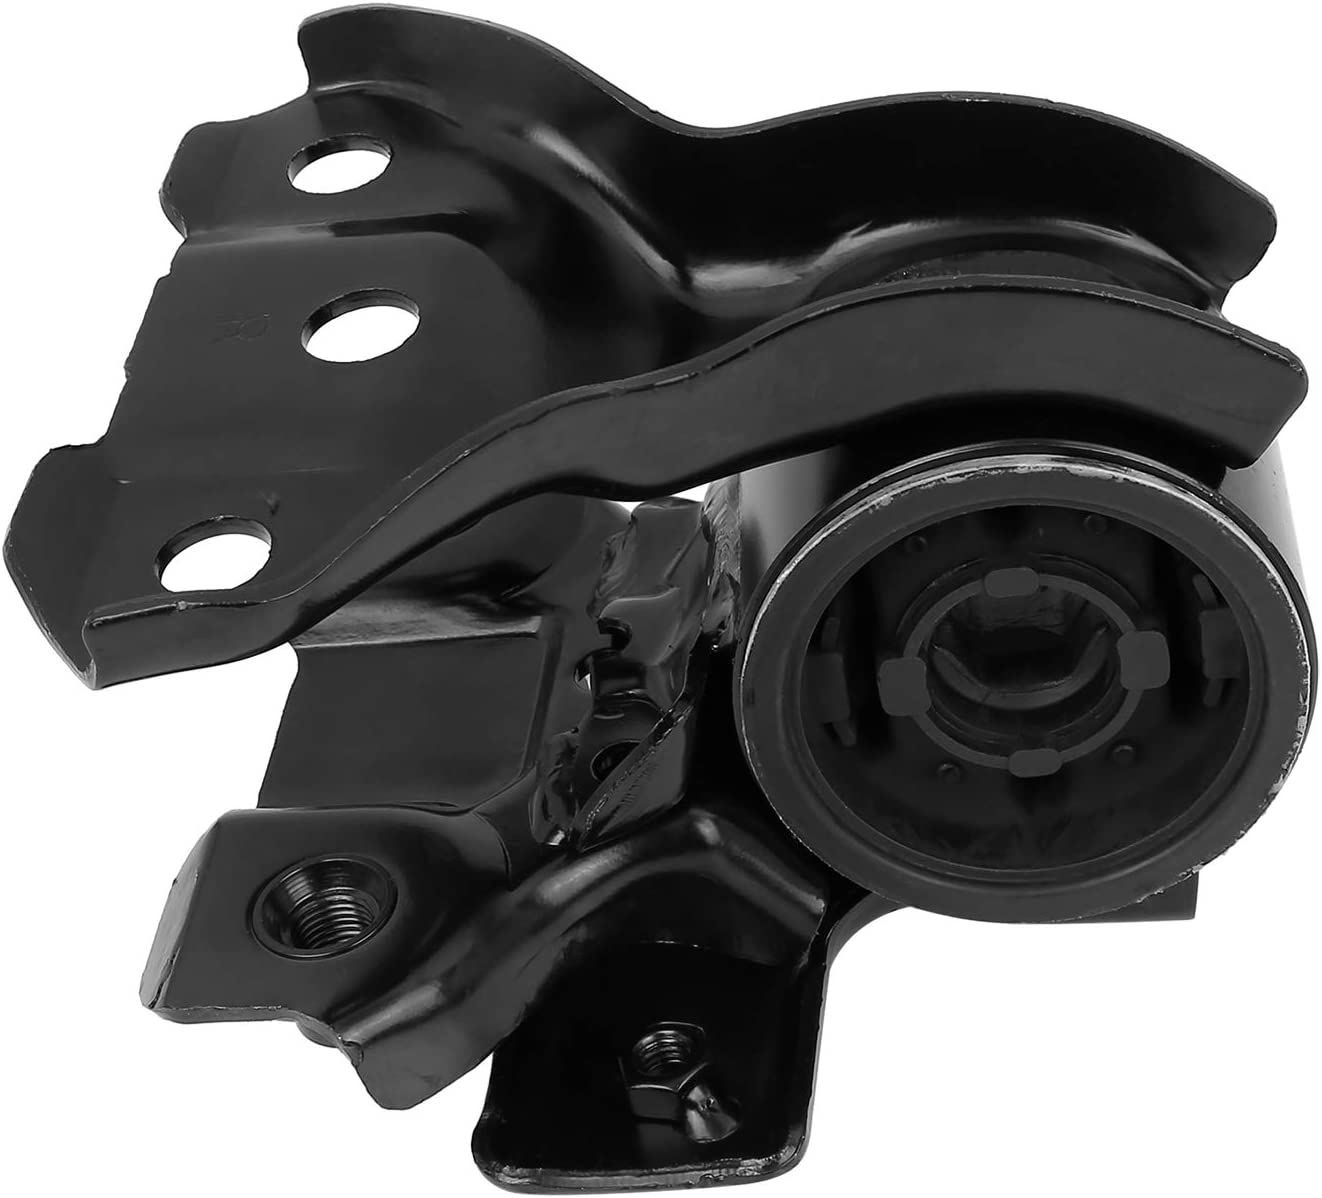 X AUTOHAUX 51395-SWA-A01 Front Lower Control Arm Bushing RH Suspension Control Arm Bushing with Bracket for Honda CR-V